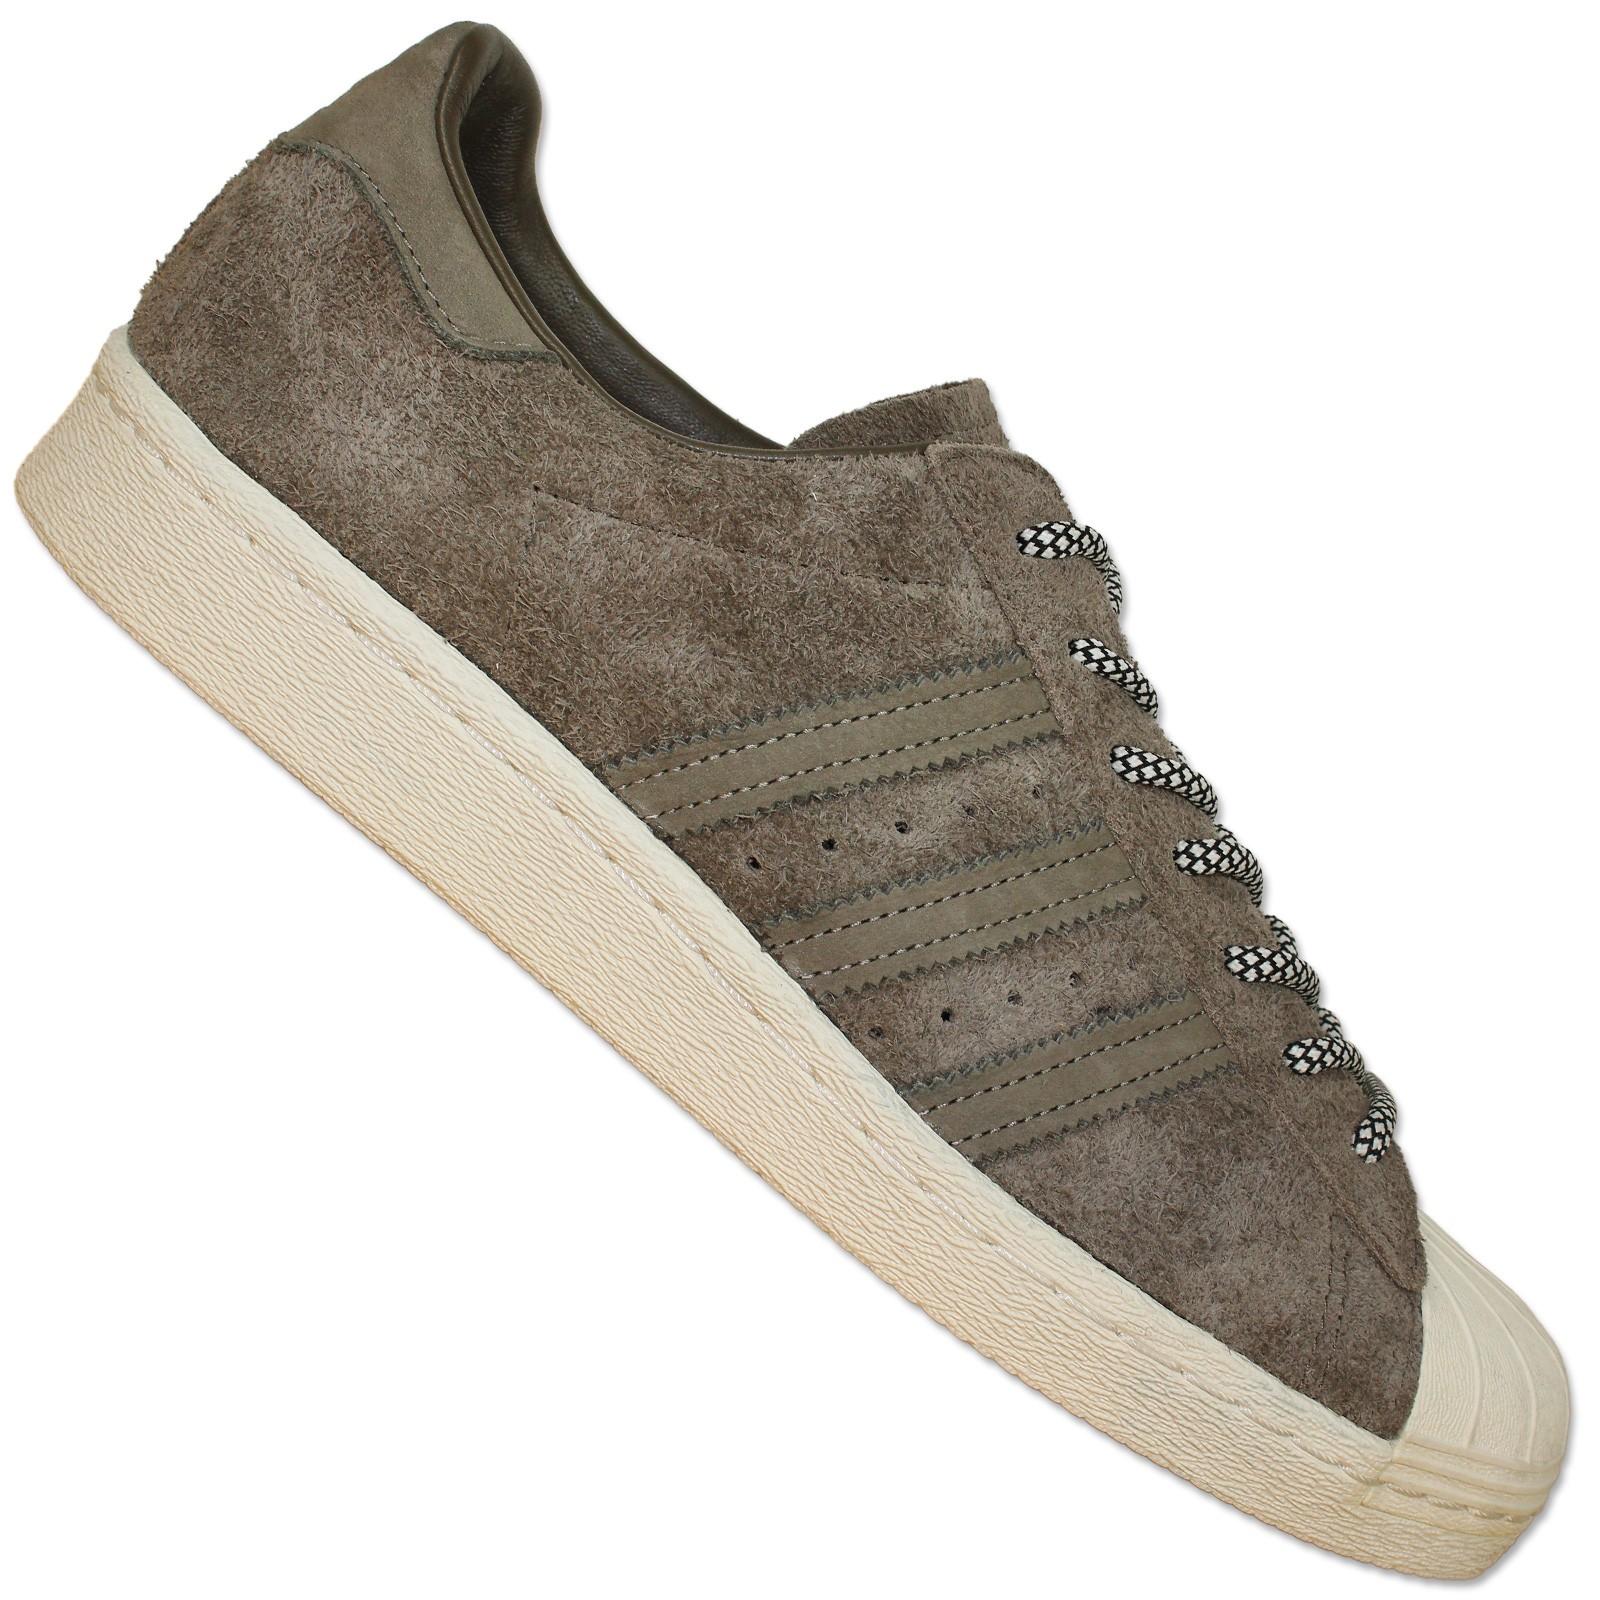 adidas originals urban superstar casual shoes suede brown. Black Bedroom Furniture Sets. Home Design Ideas